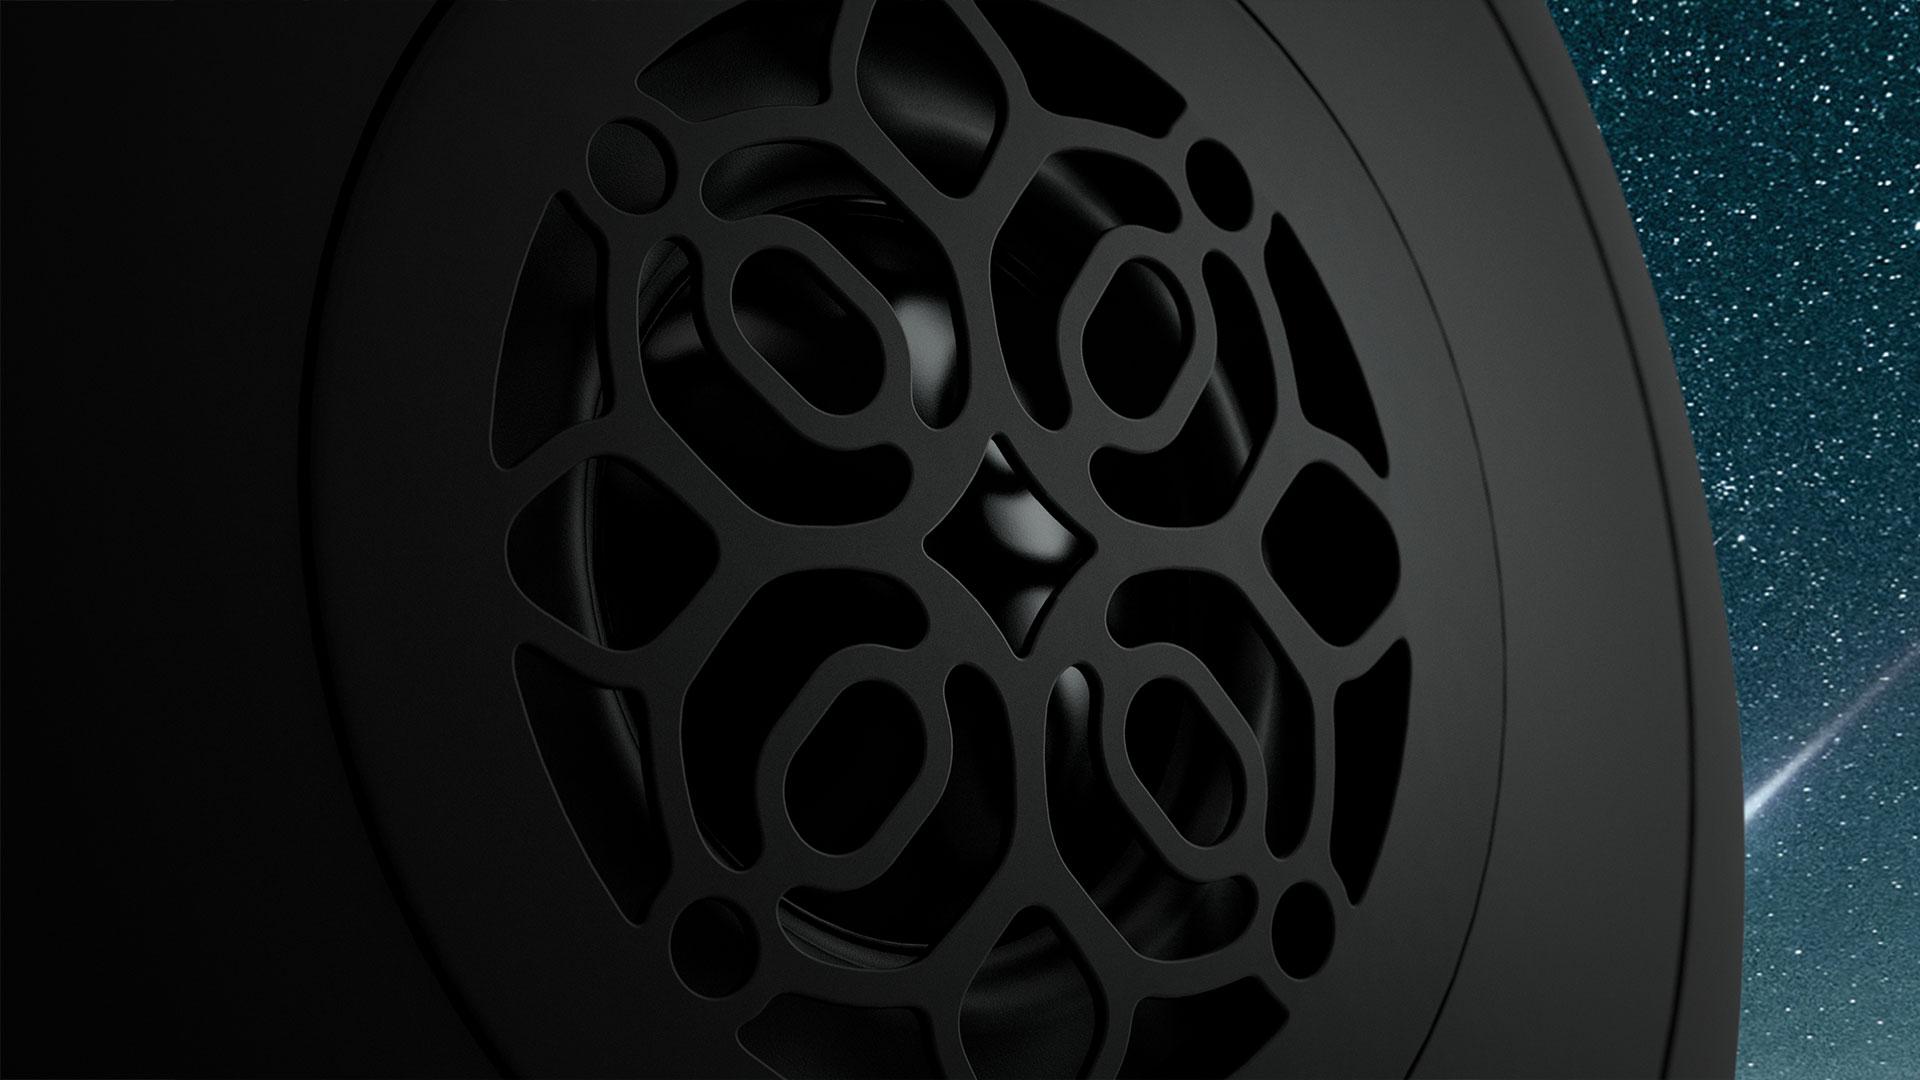 Devialet Phantom Reactor Matte Black Edition - Now Available | Unilet Sound & Vision